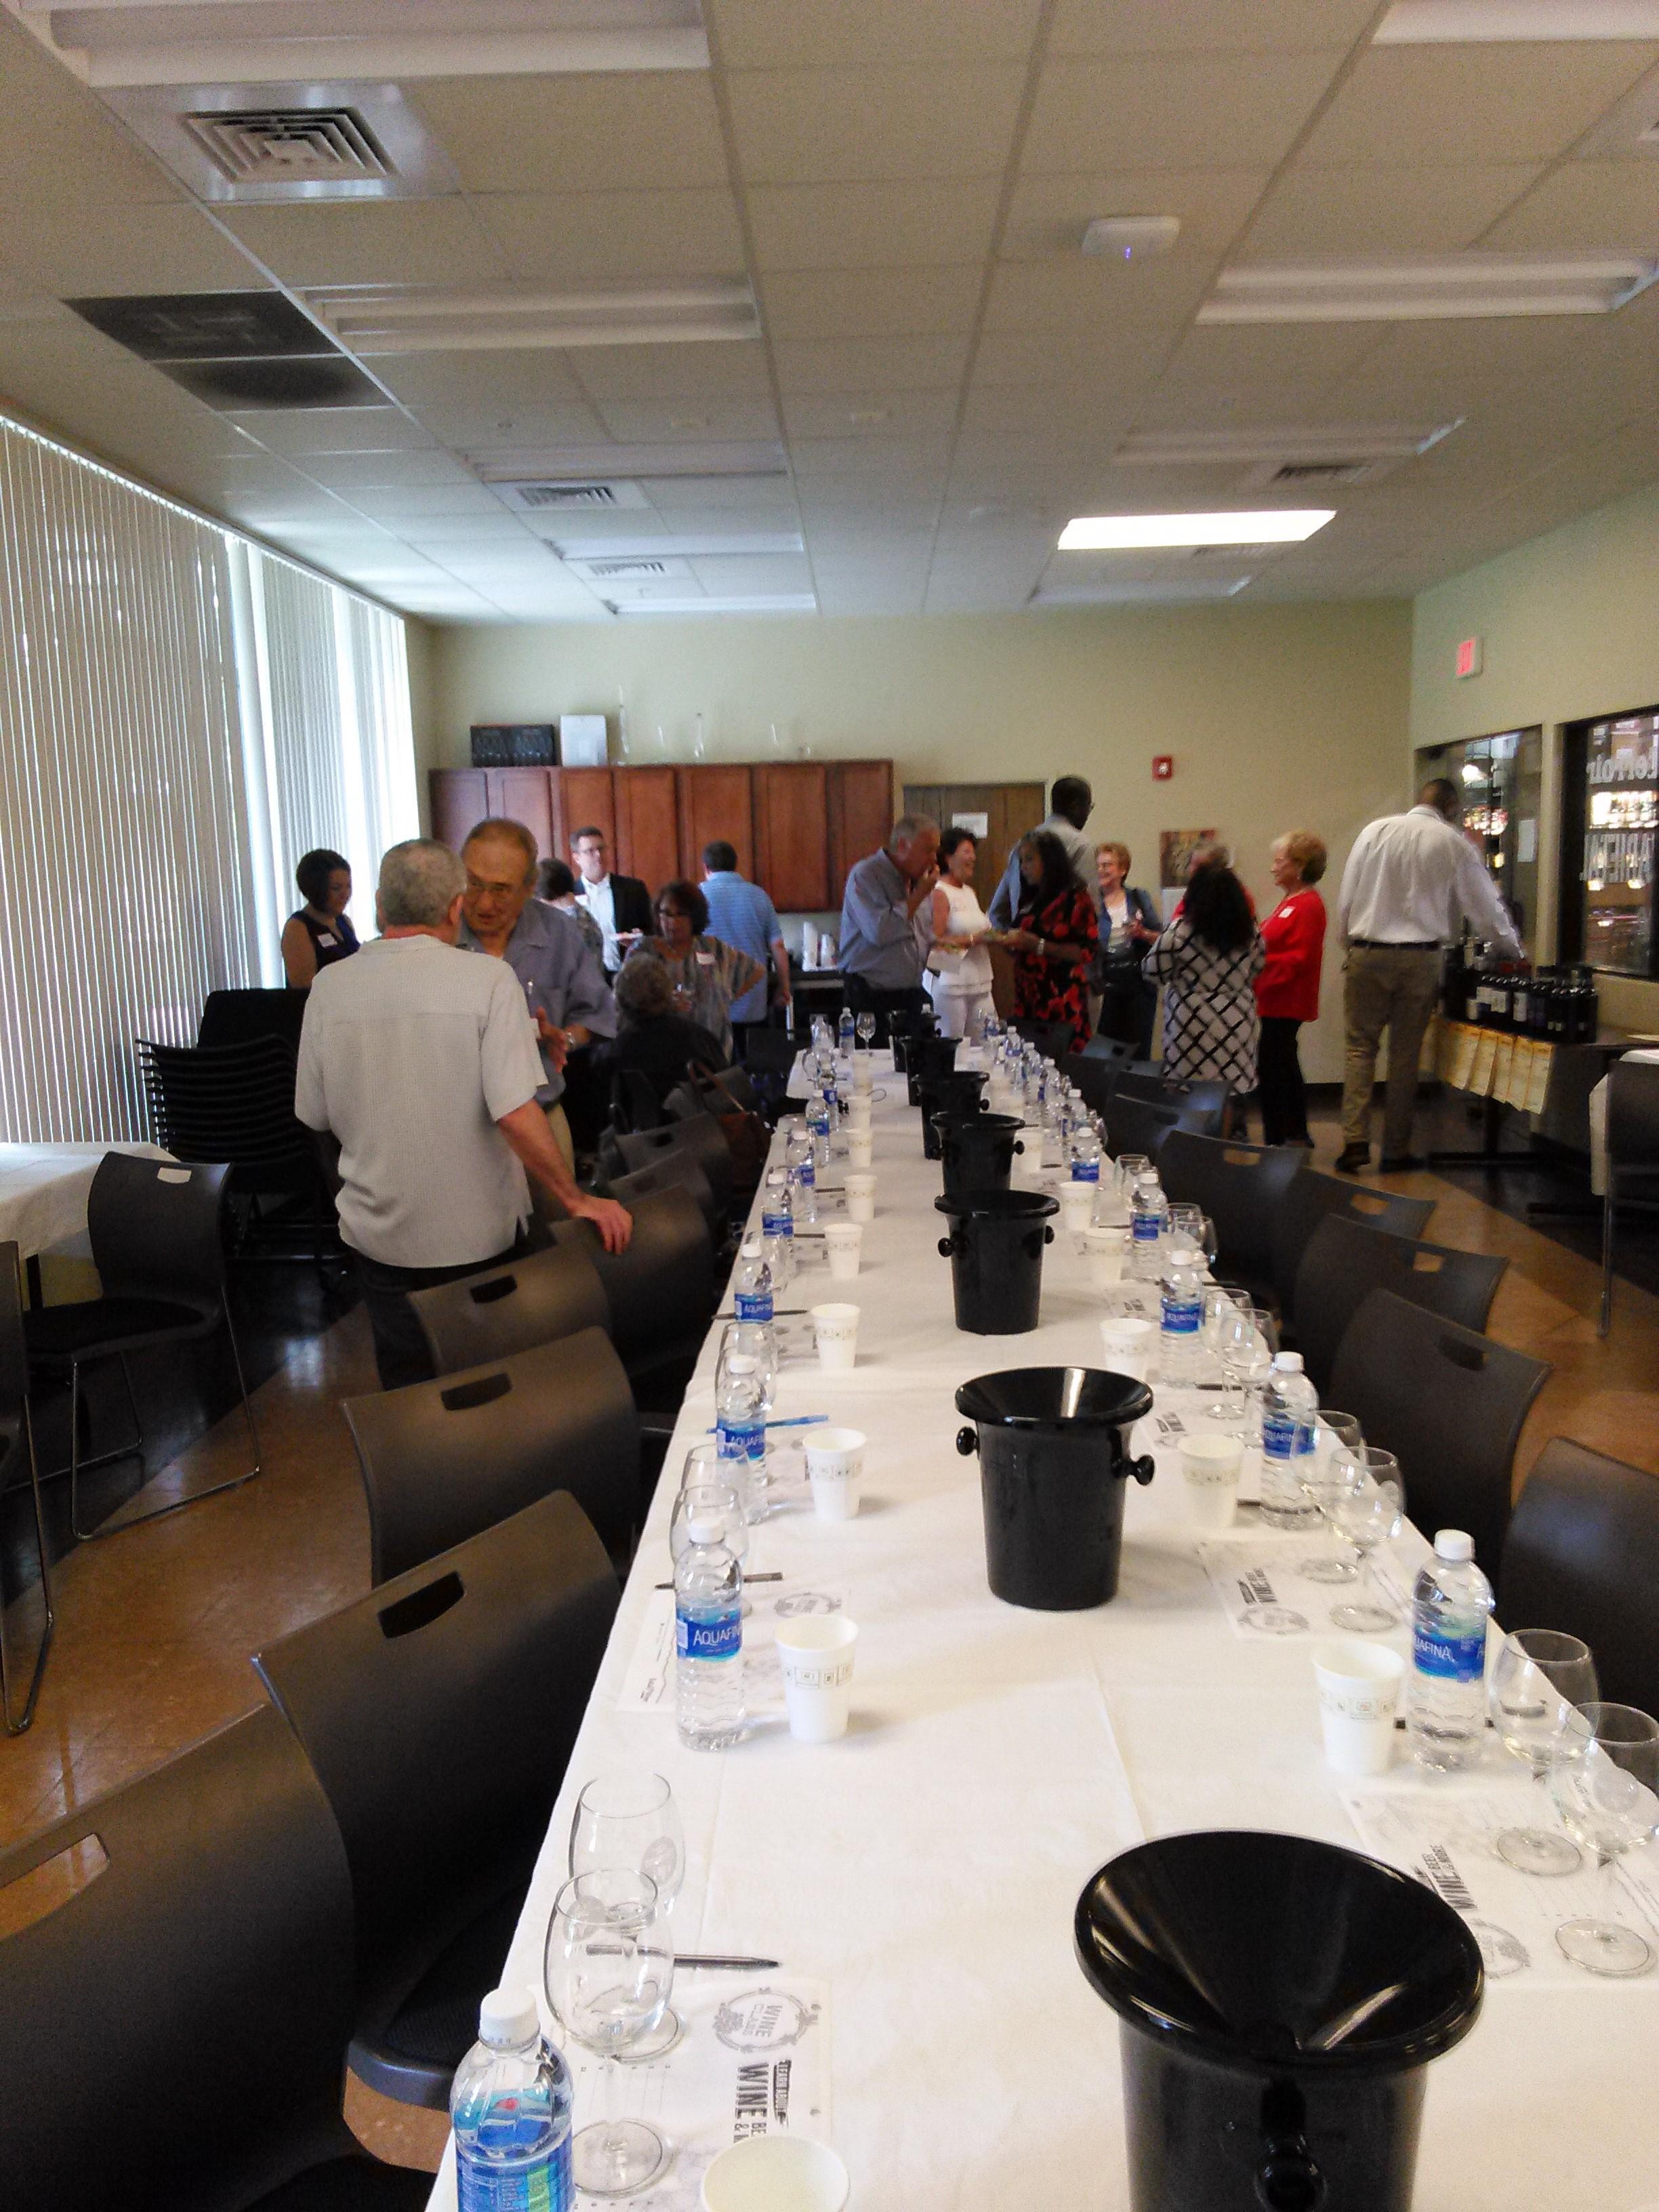 attendees of Wine tasting night